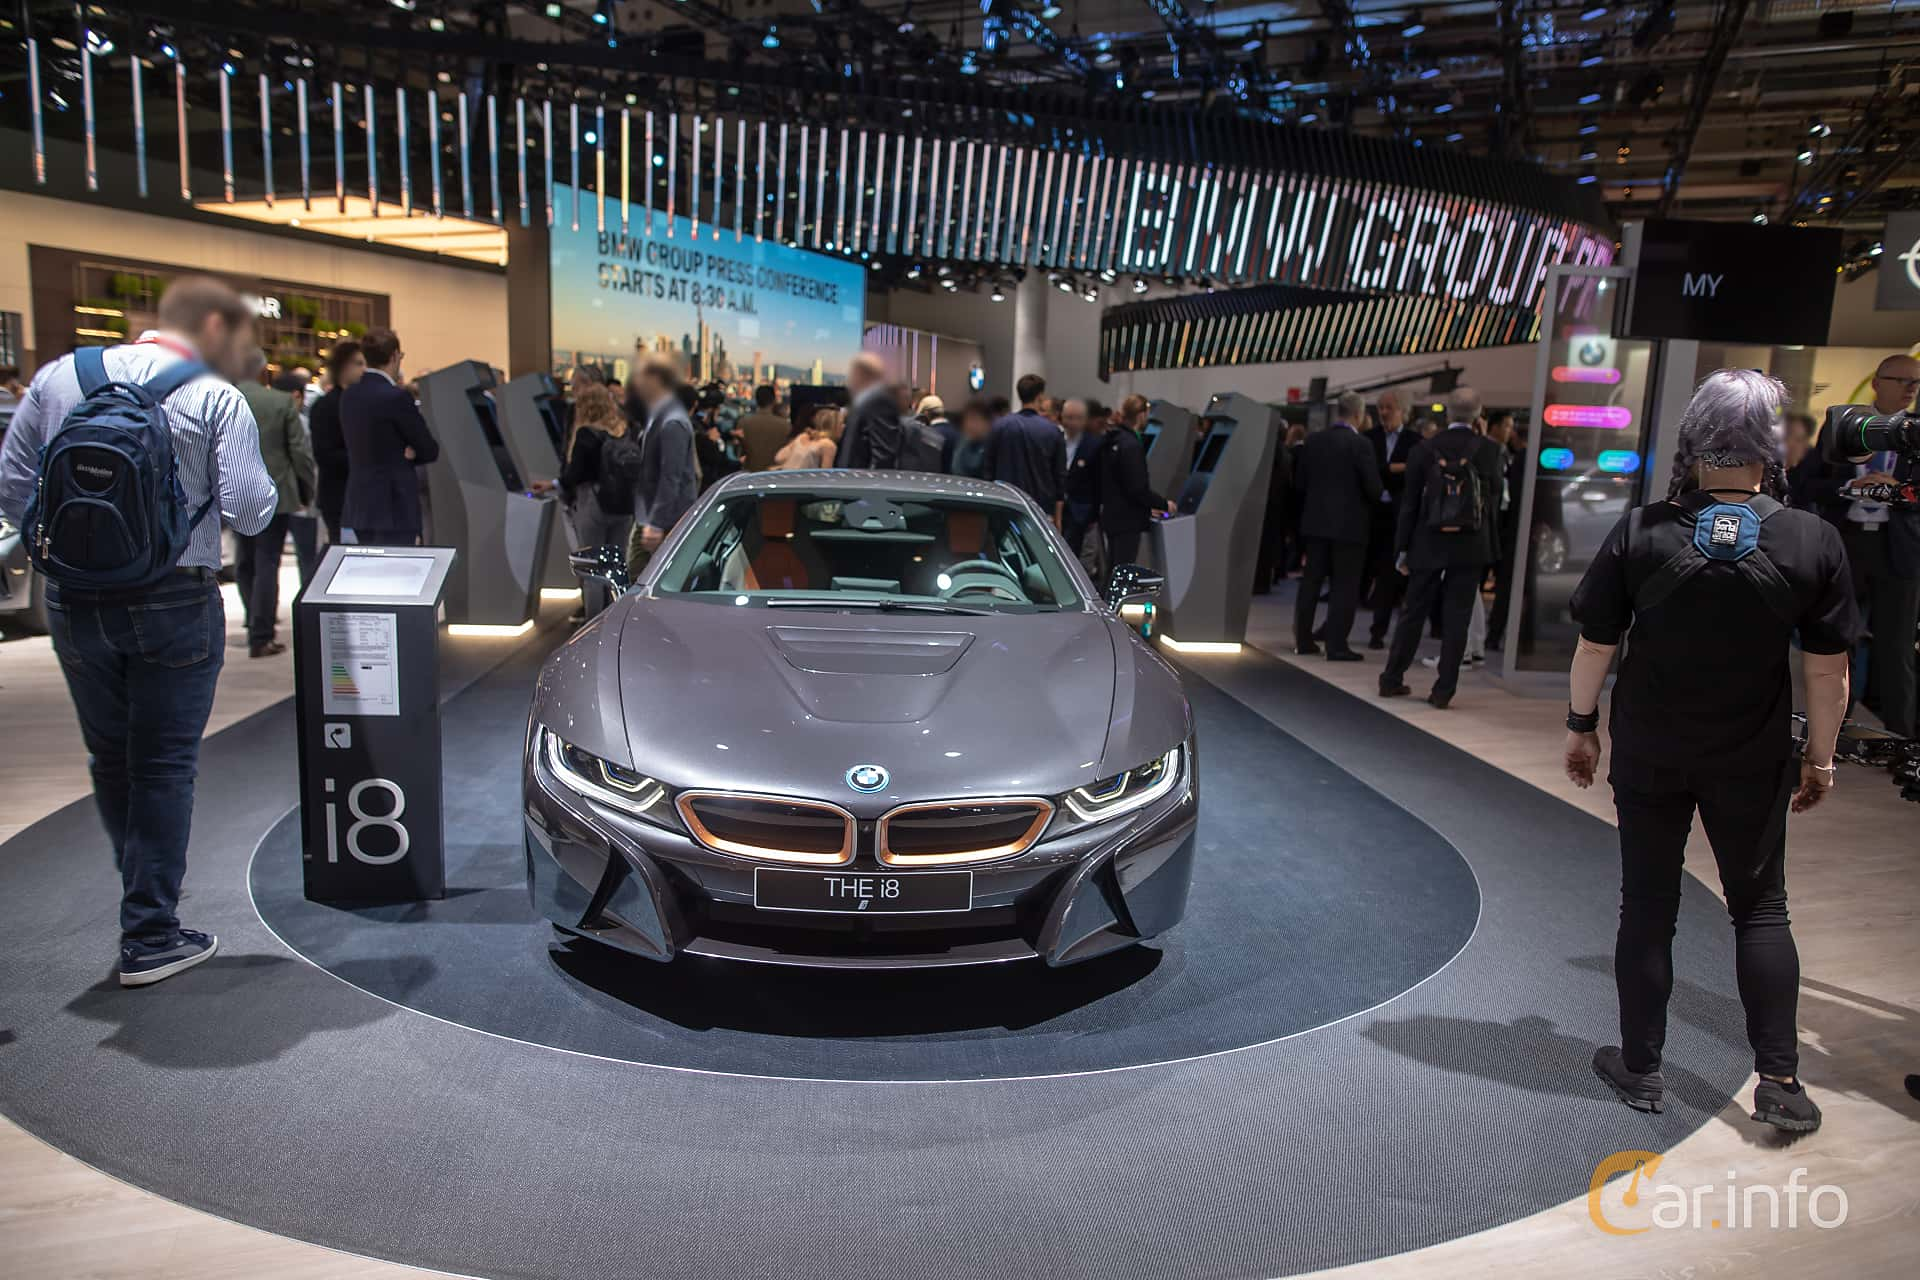 BMW i8 1.5 + 11.6 kWh Steptronic, 374hp, 2020 at IAA 2019